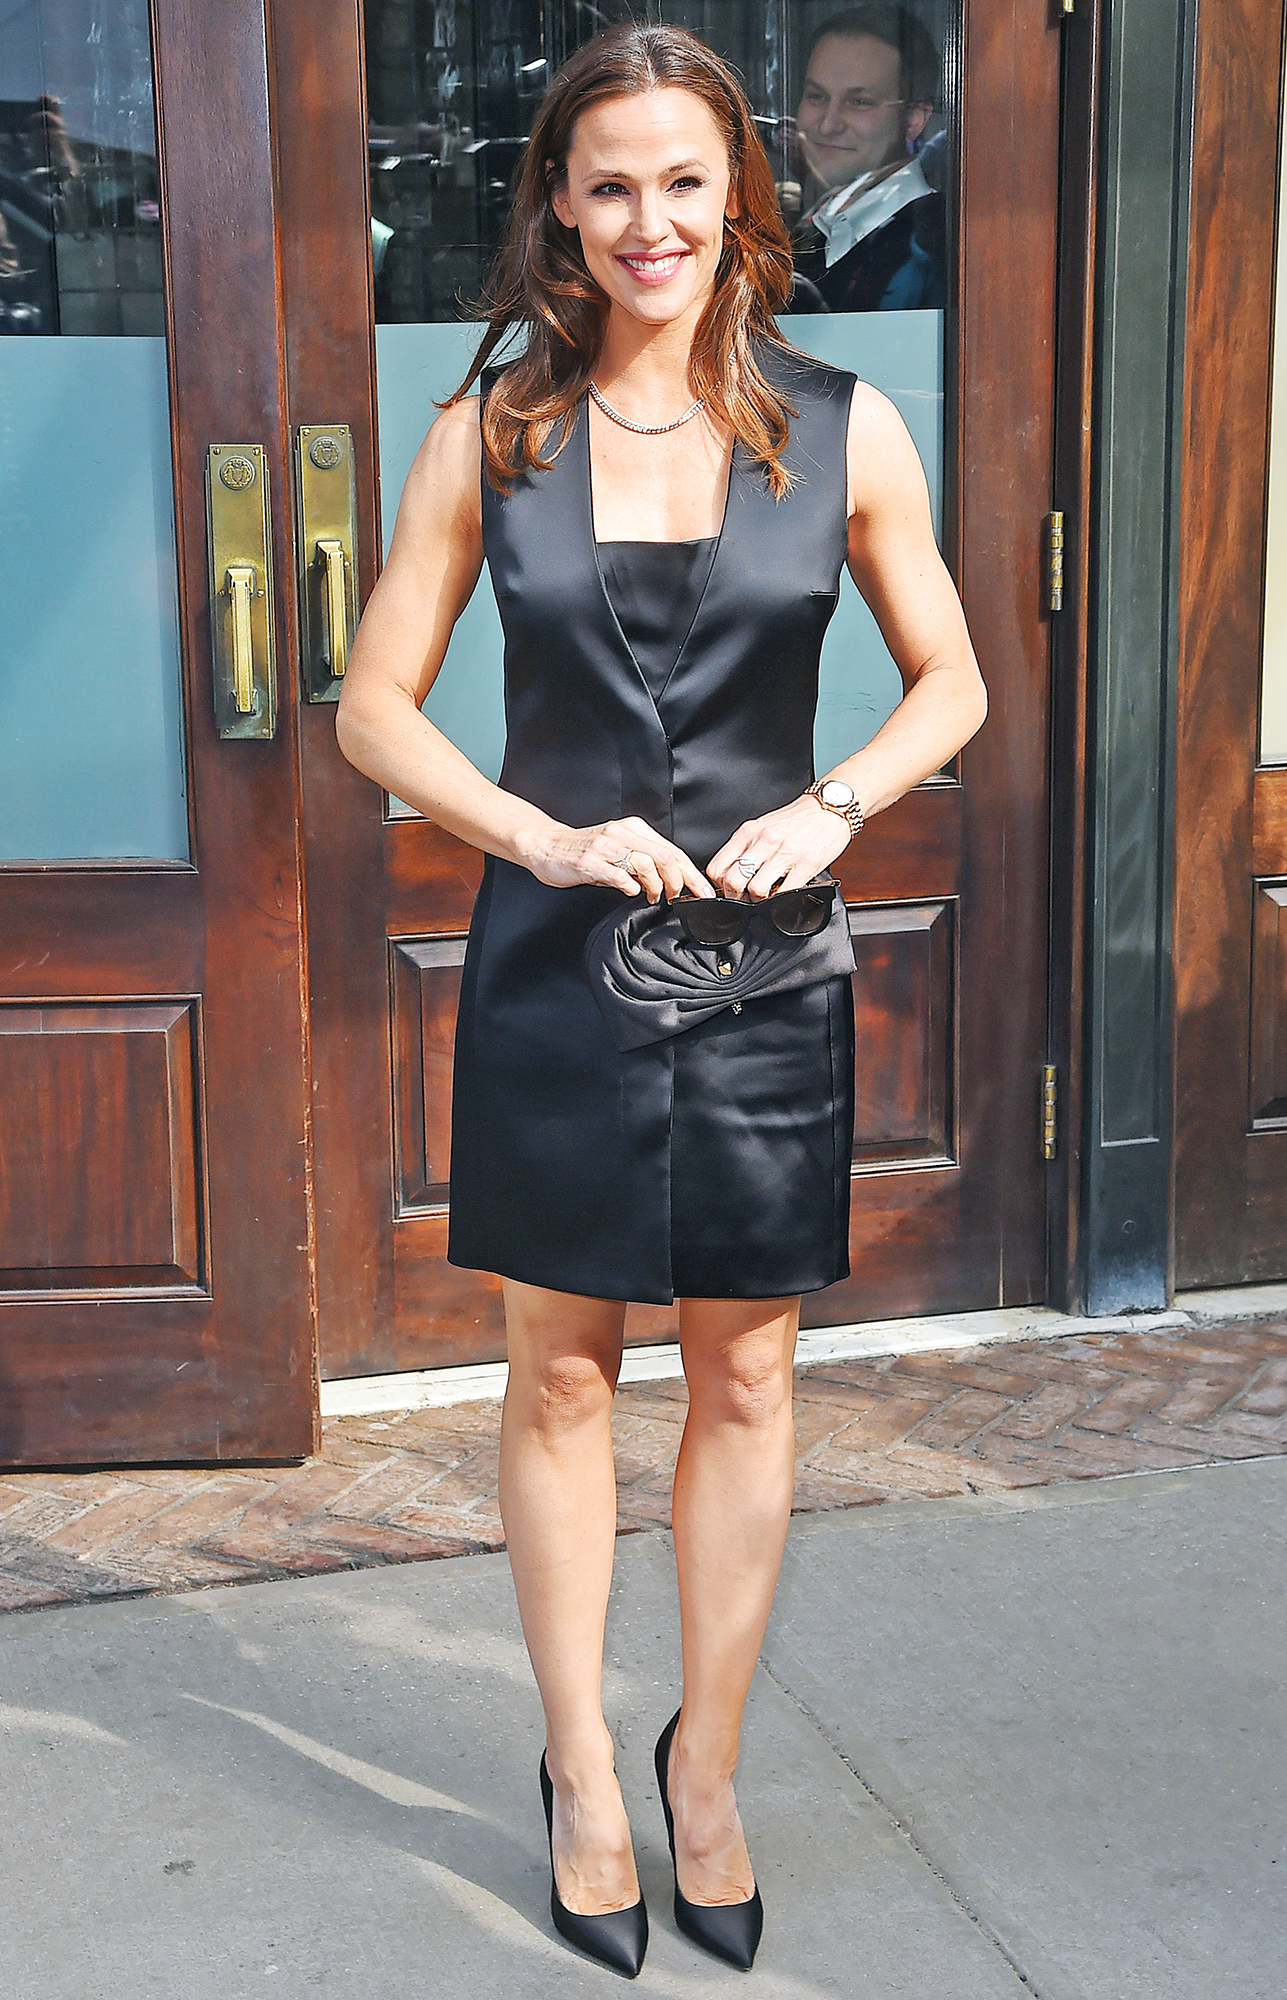 Jennifer Garner Best Body of Her Life